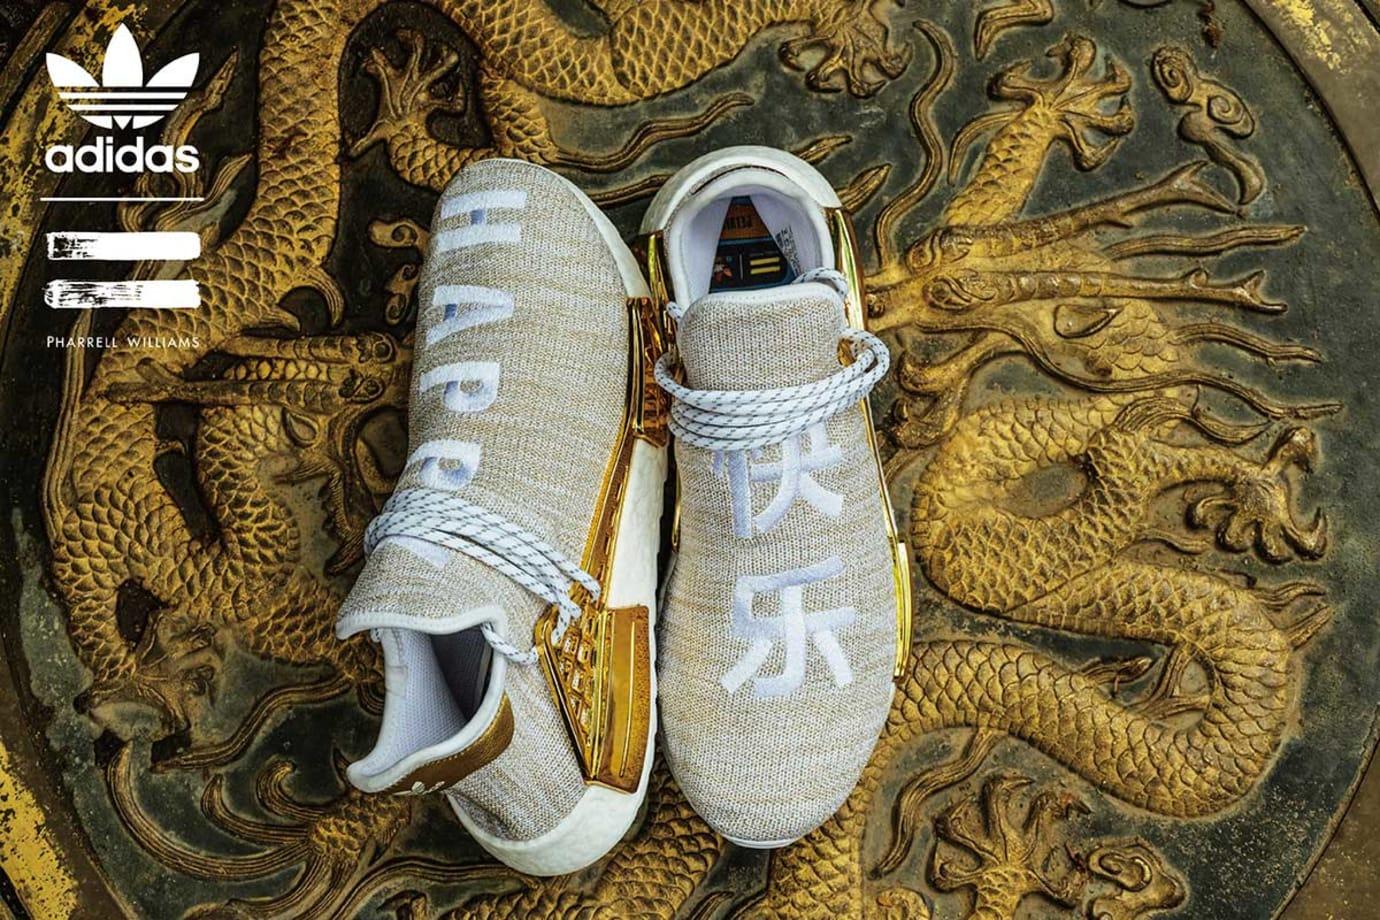 a873d98c1 Image via Adidas Pharrell Williams x Adidas NMD Hu  China Pack  Gold F99762